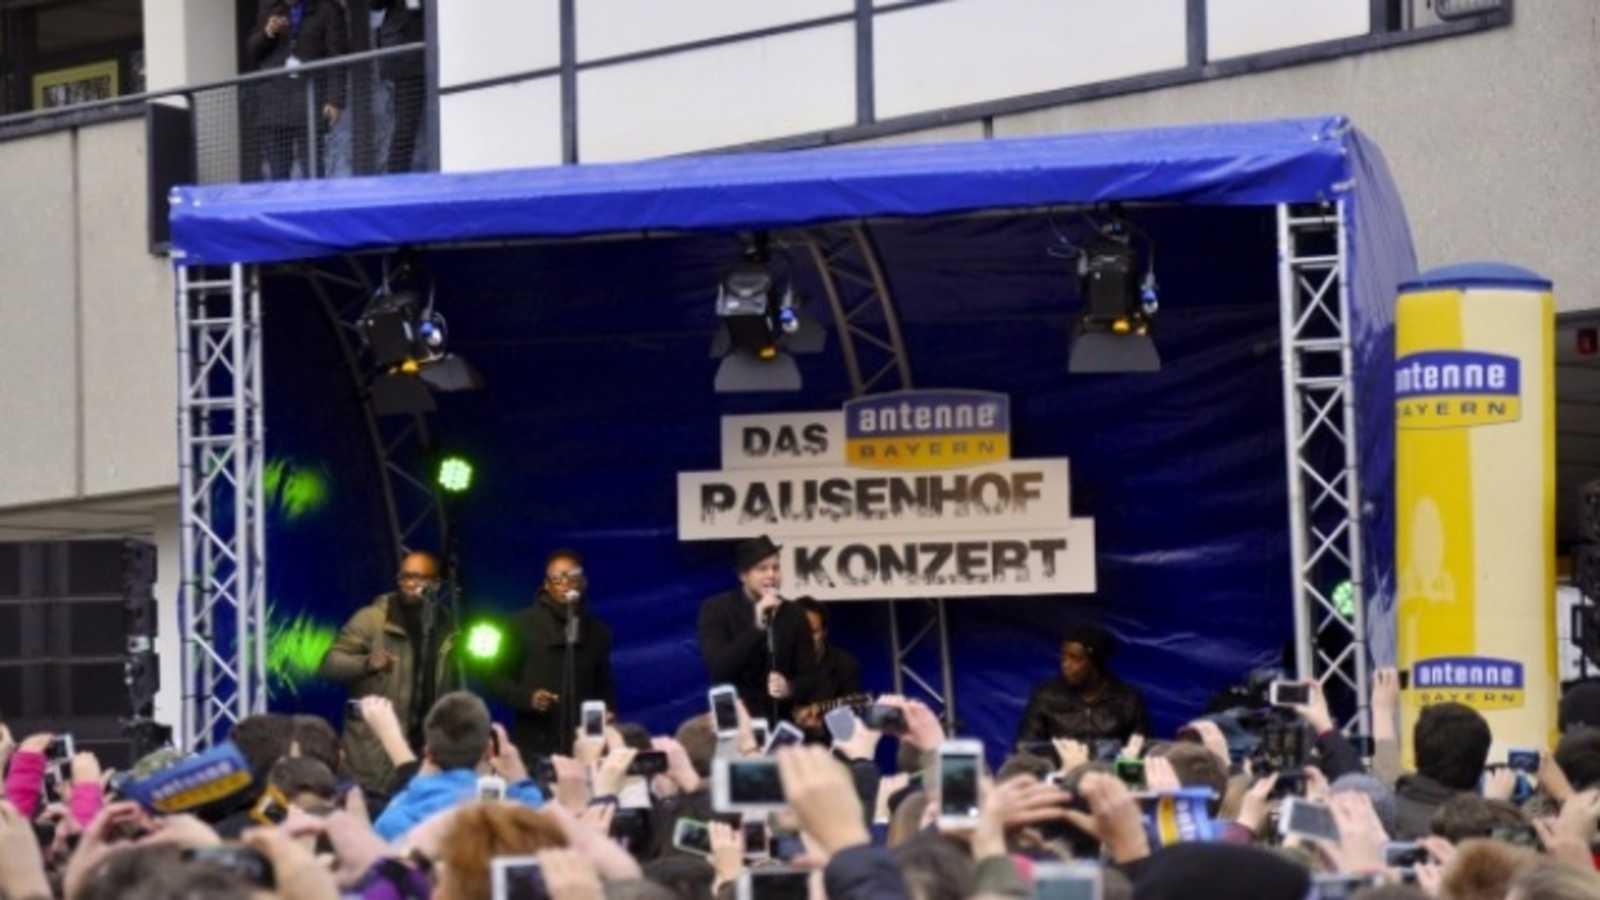 Antenne Bayern Single Des Tages